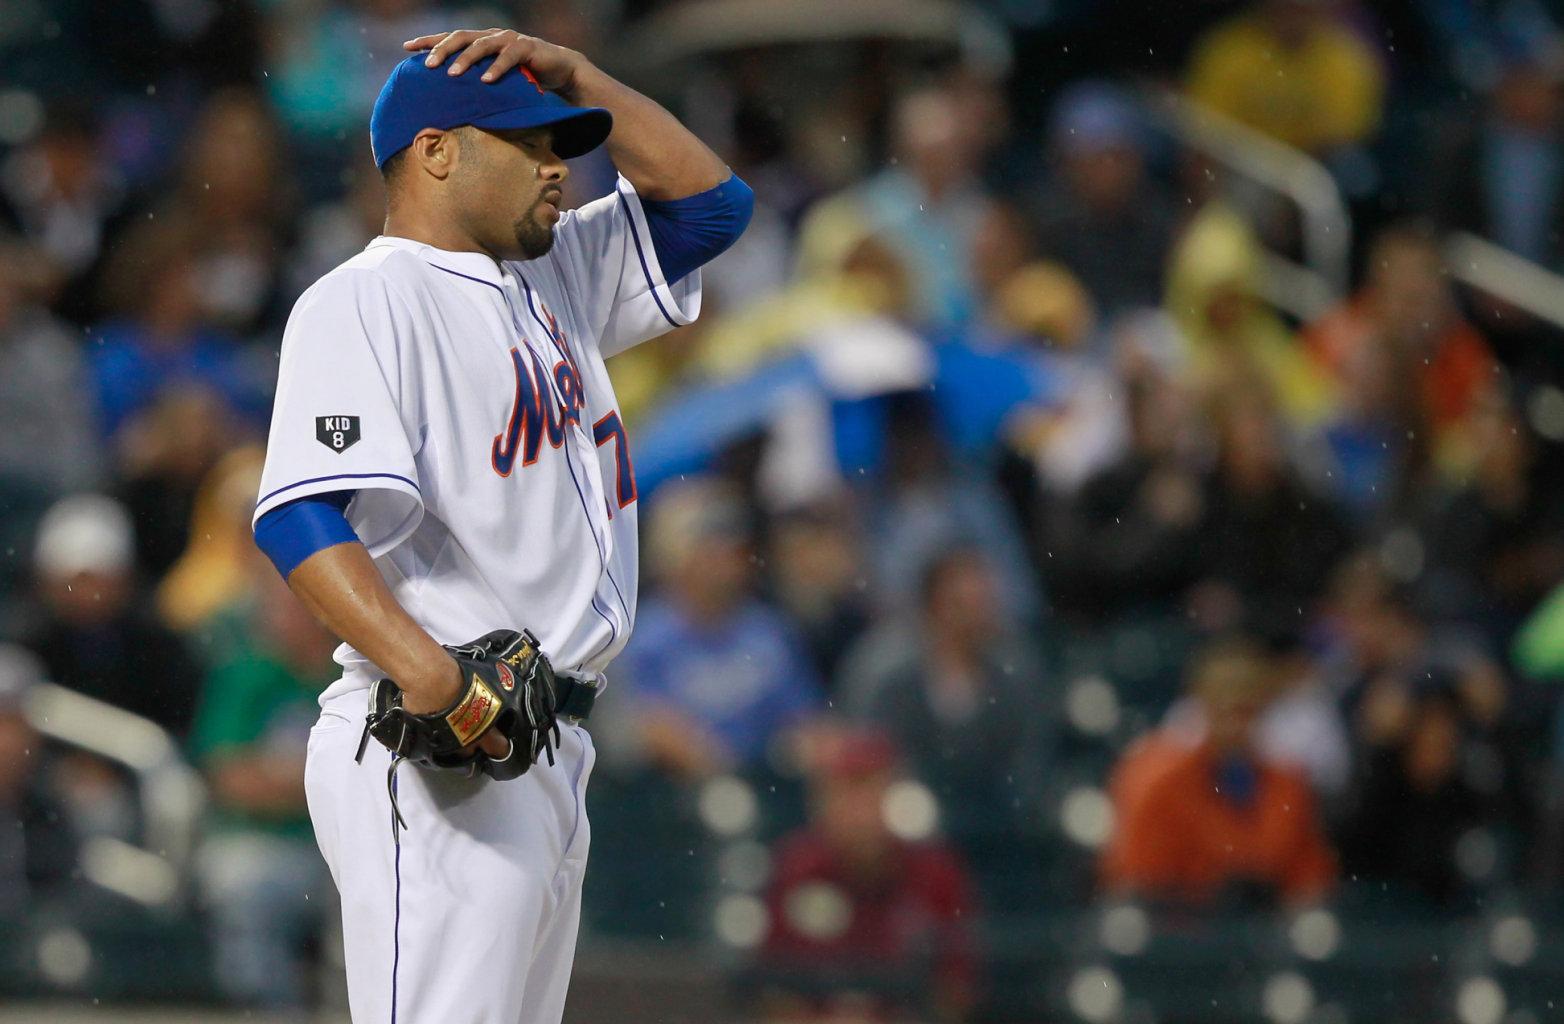 Oh-No-Han! Santana Shelled, But Despite Late Rally Mets Fall 7-6 To Dodgers